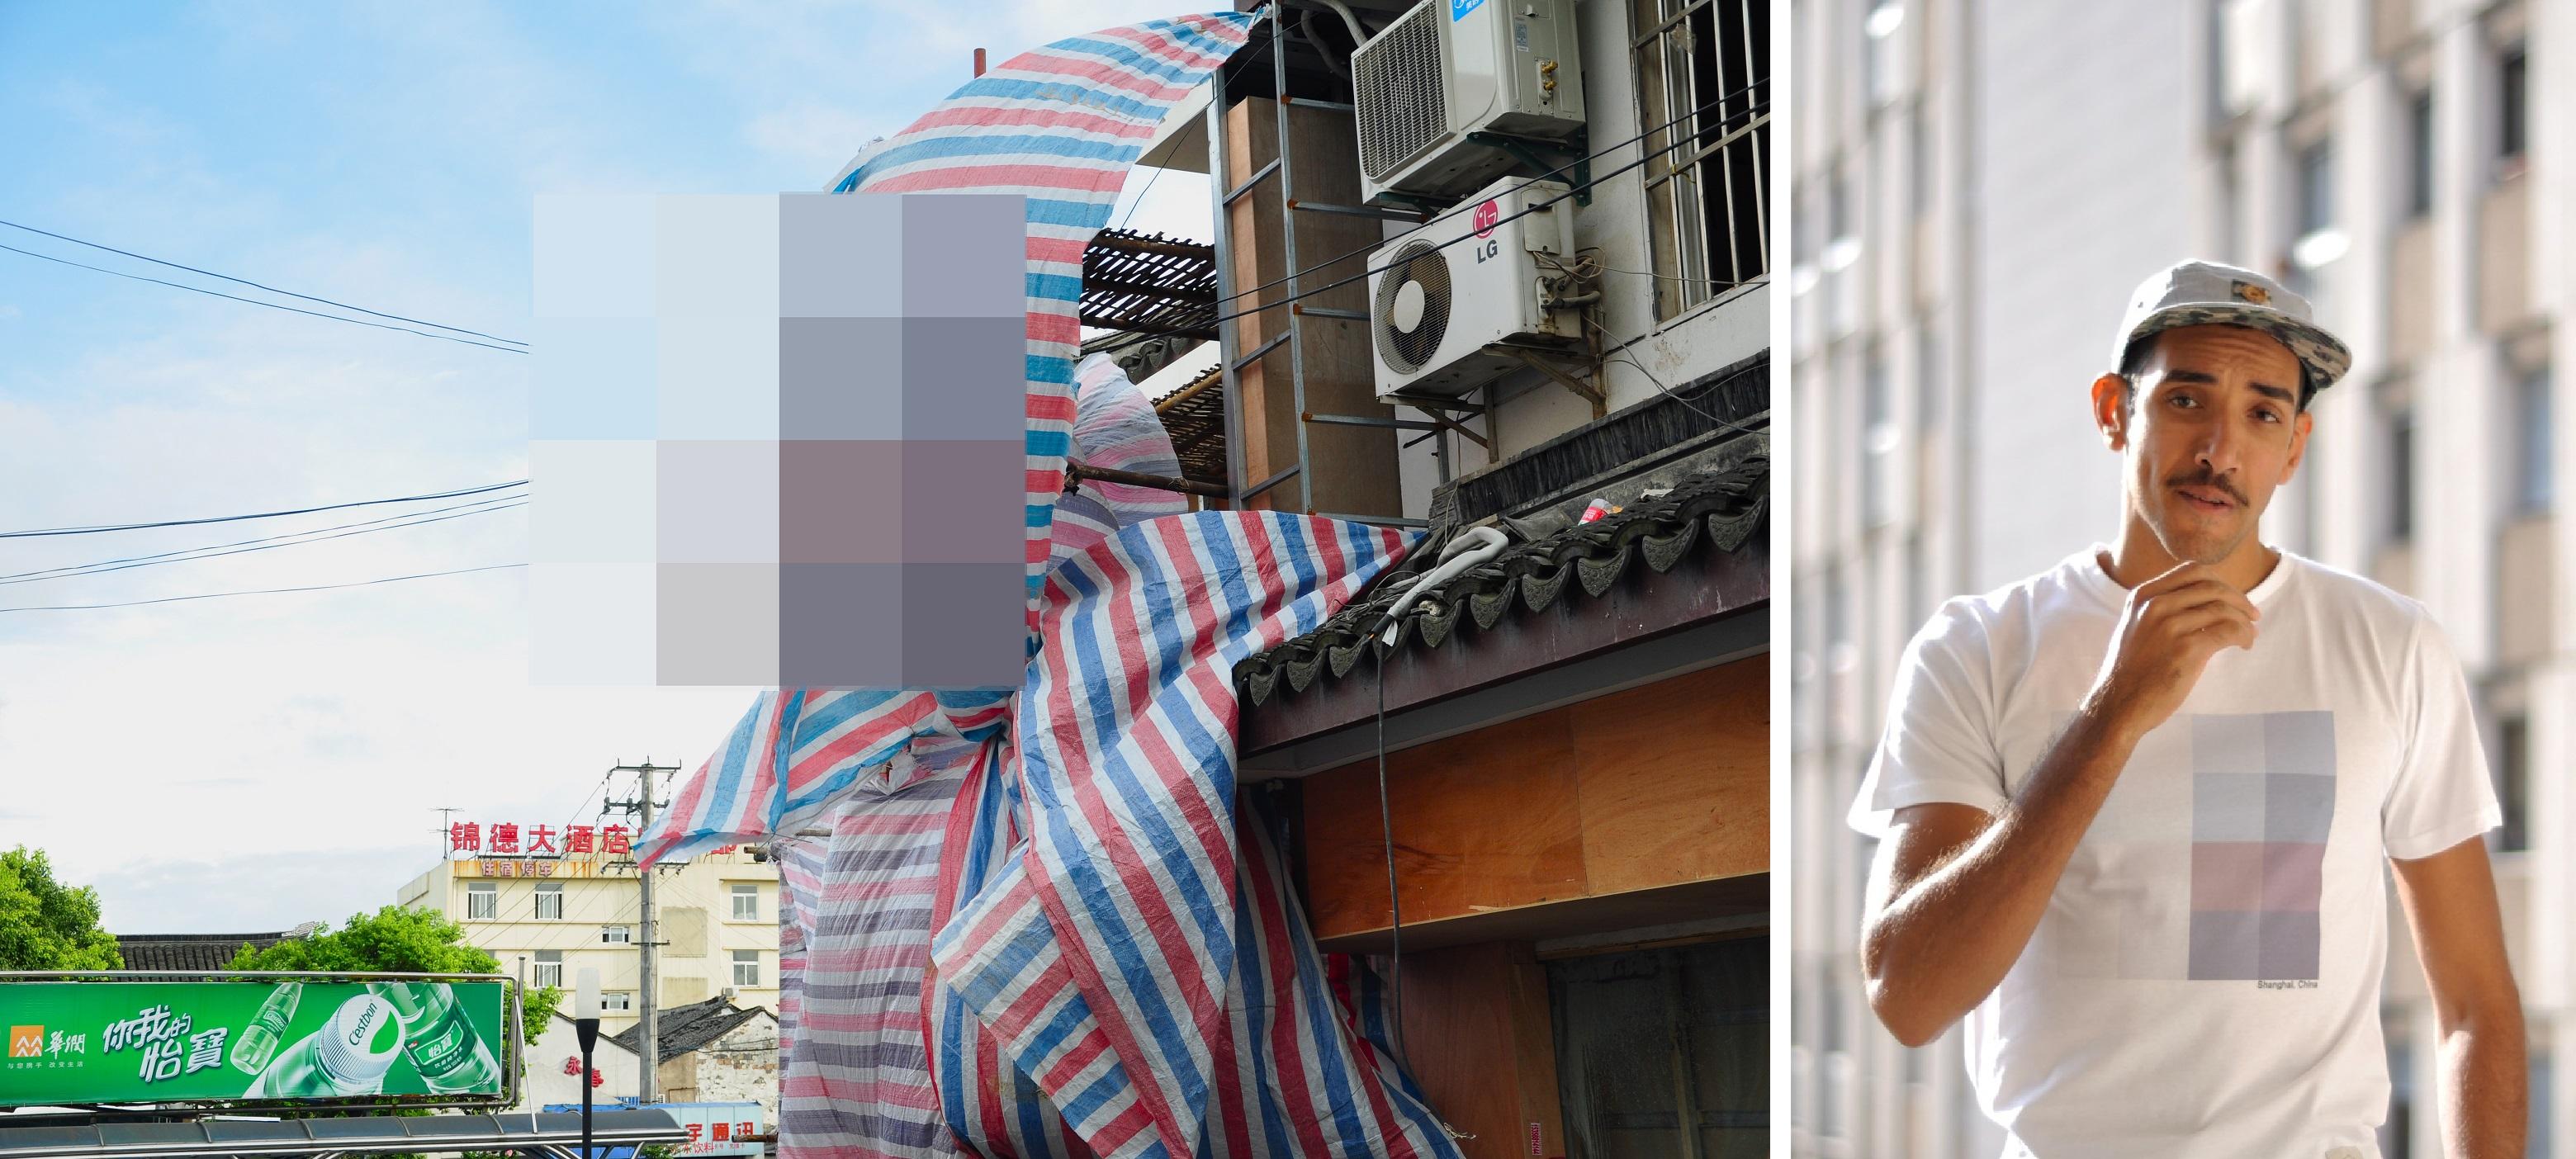 https://backend.streetpress.com/sites/default/files/shangai.jpg